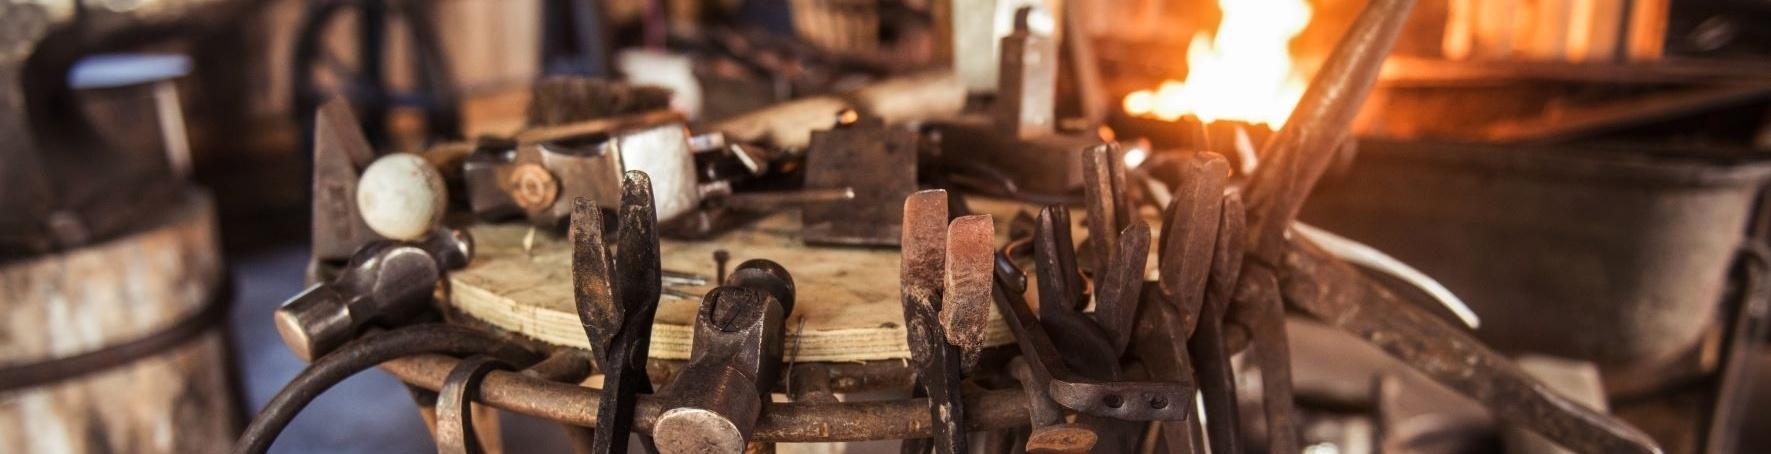 WLB Blacksmith Shop